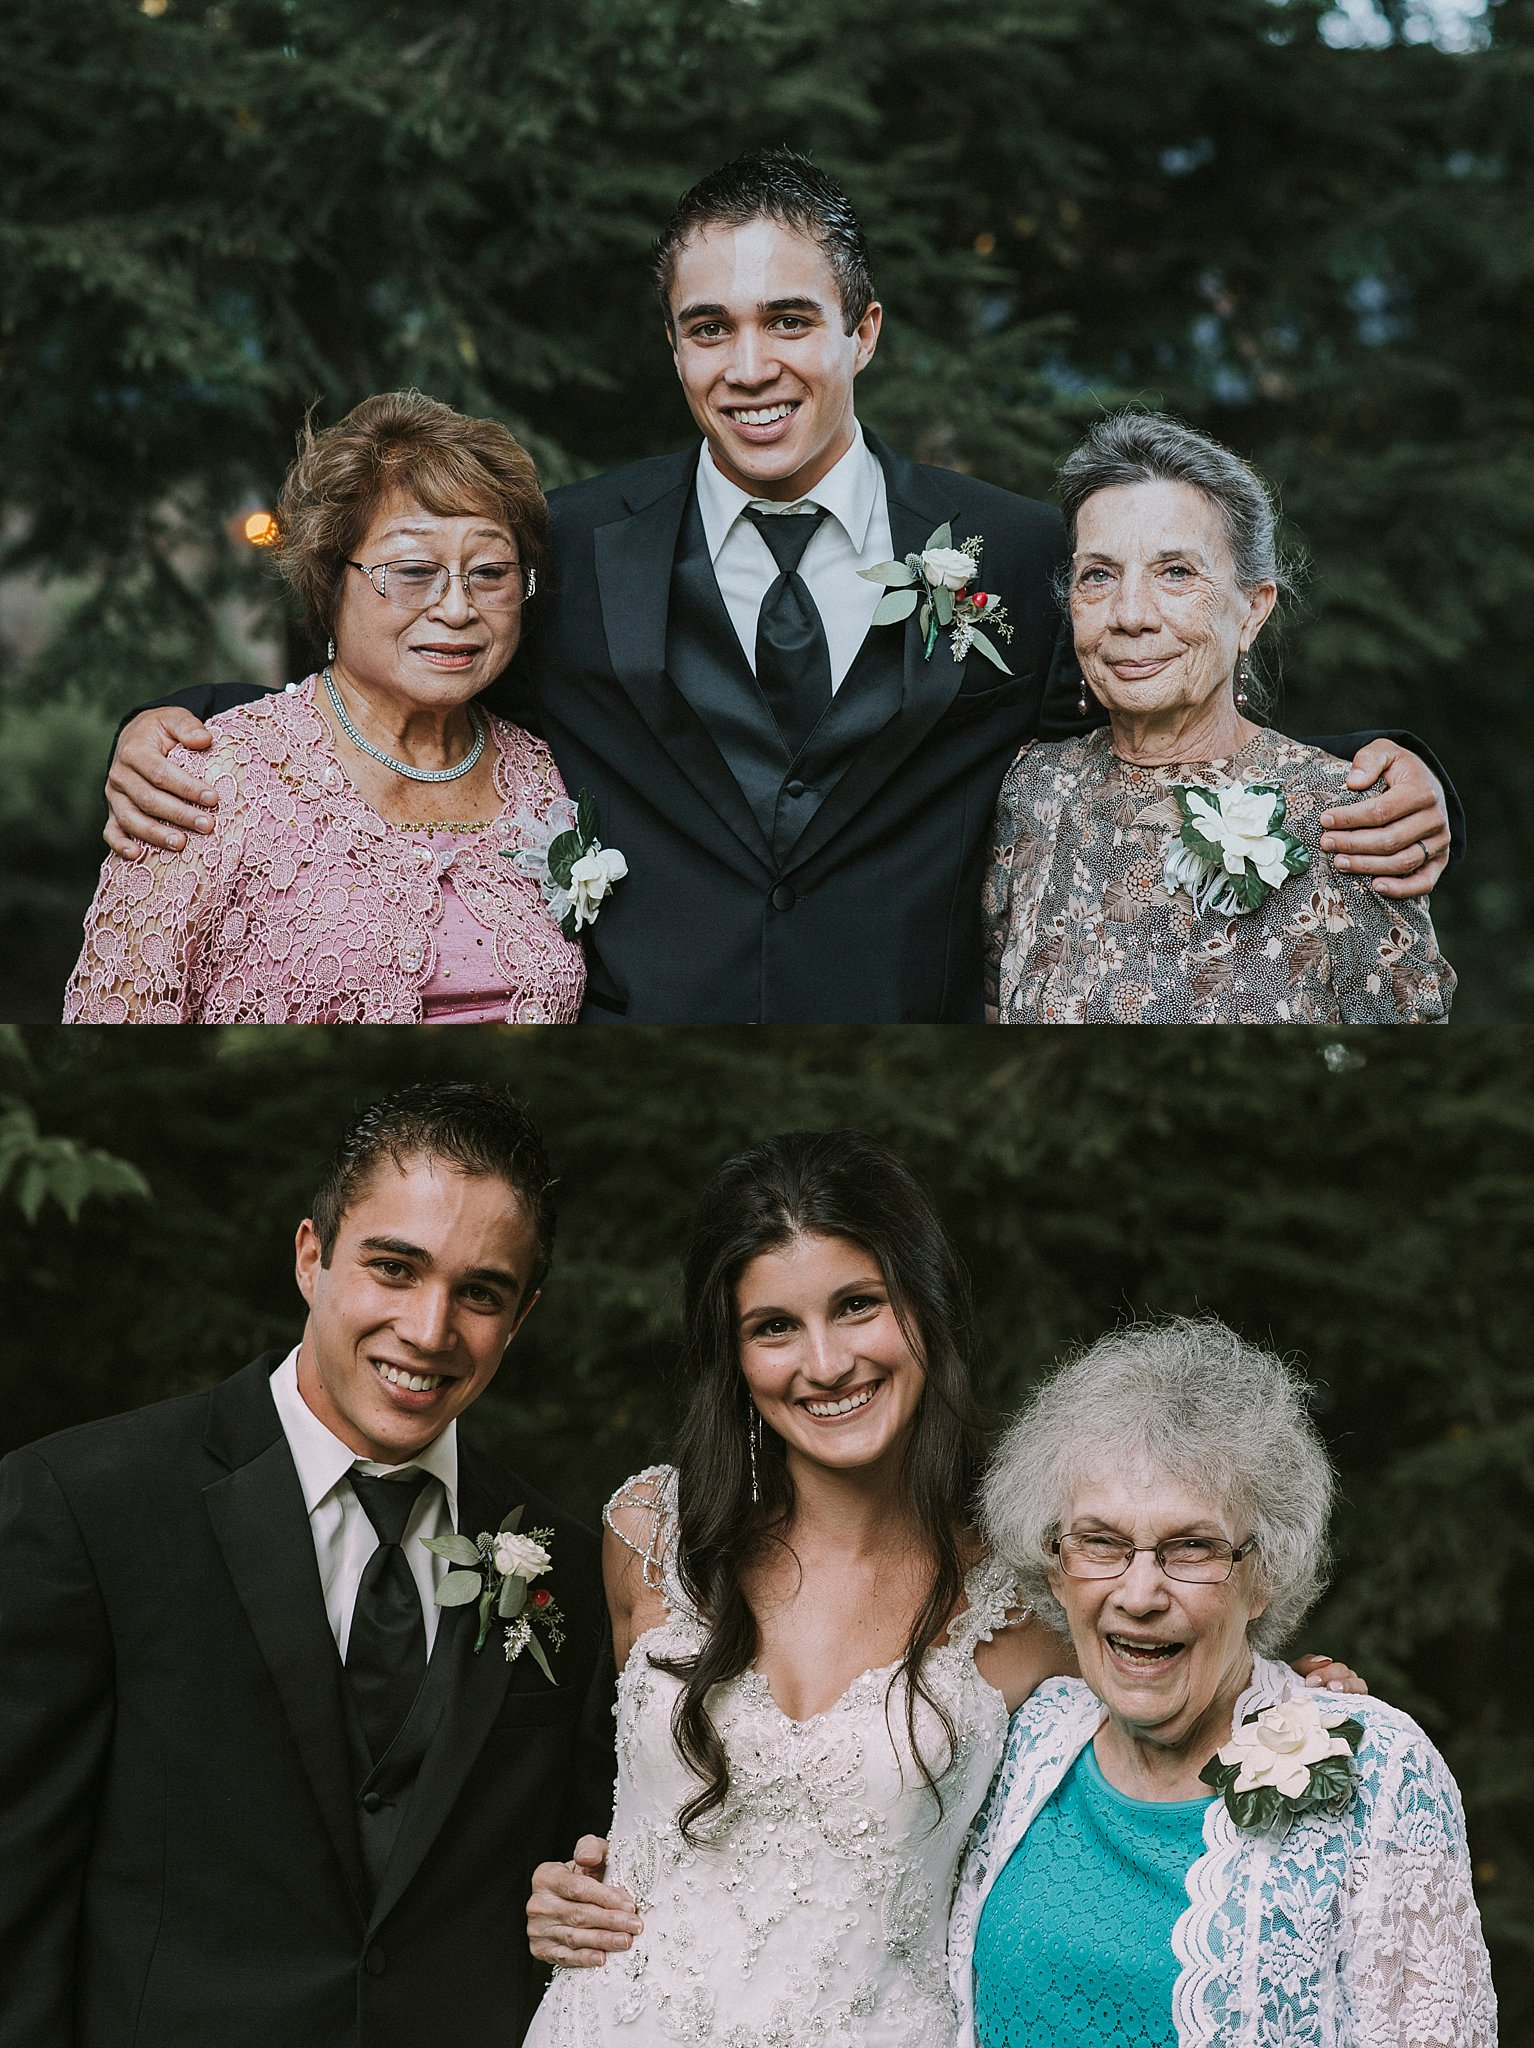 Grandmas at weddings